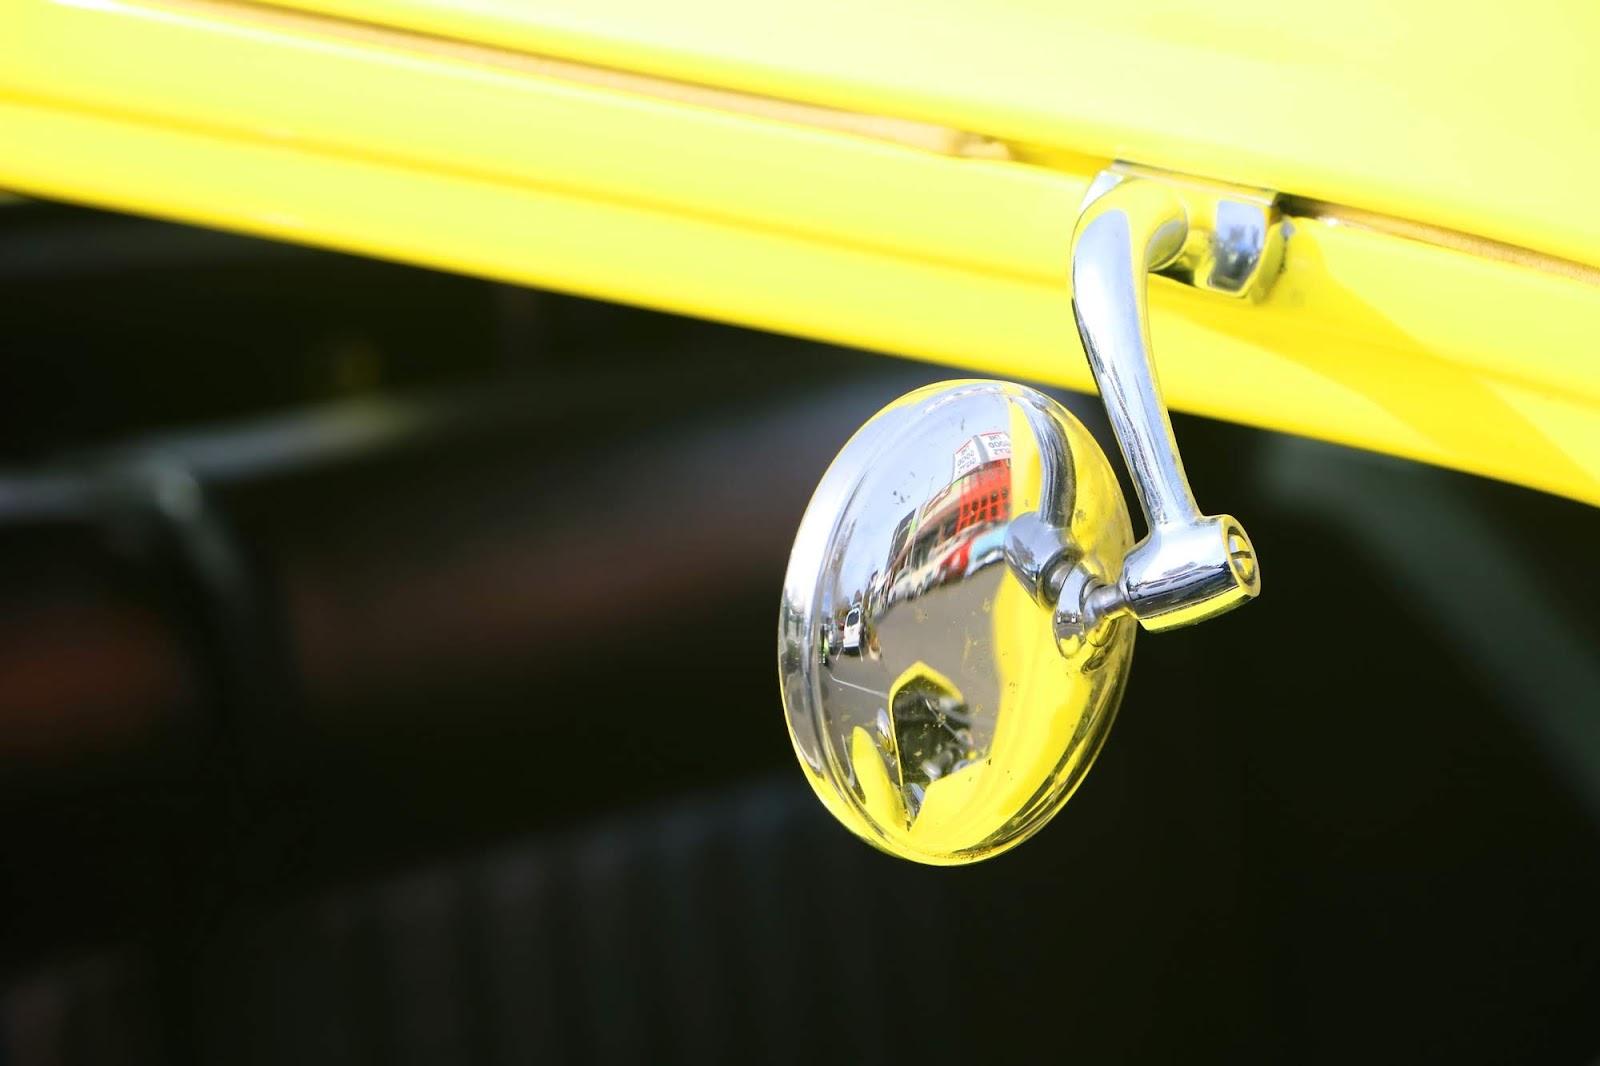 _Detail - Ford Hot Rod Yellow Mirror.jpg